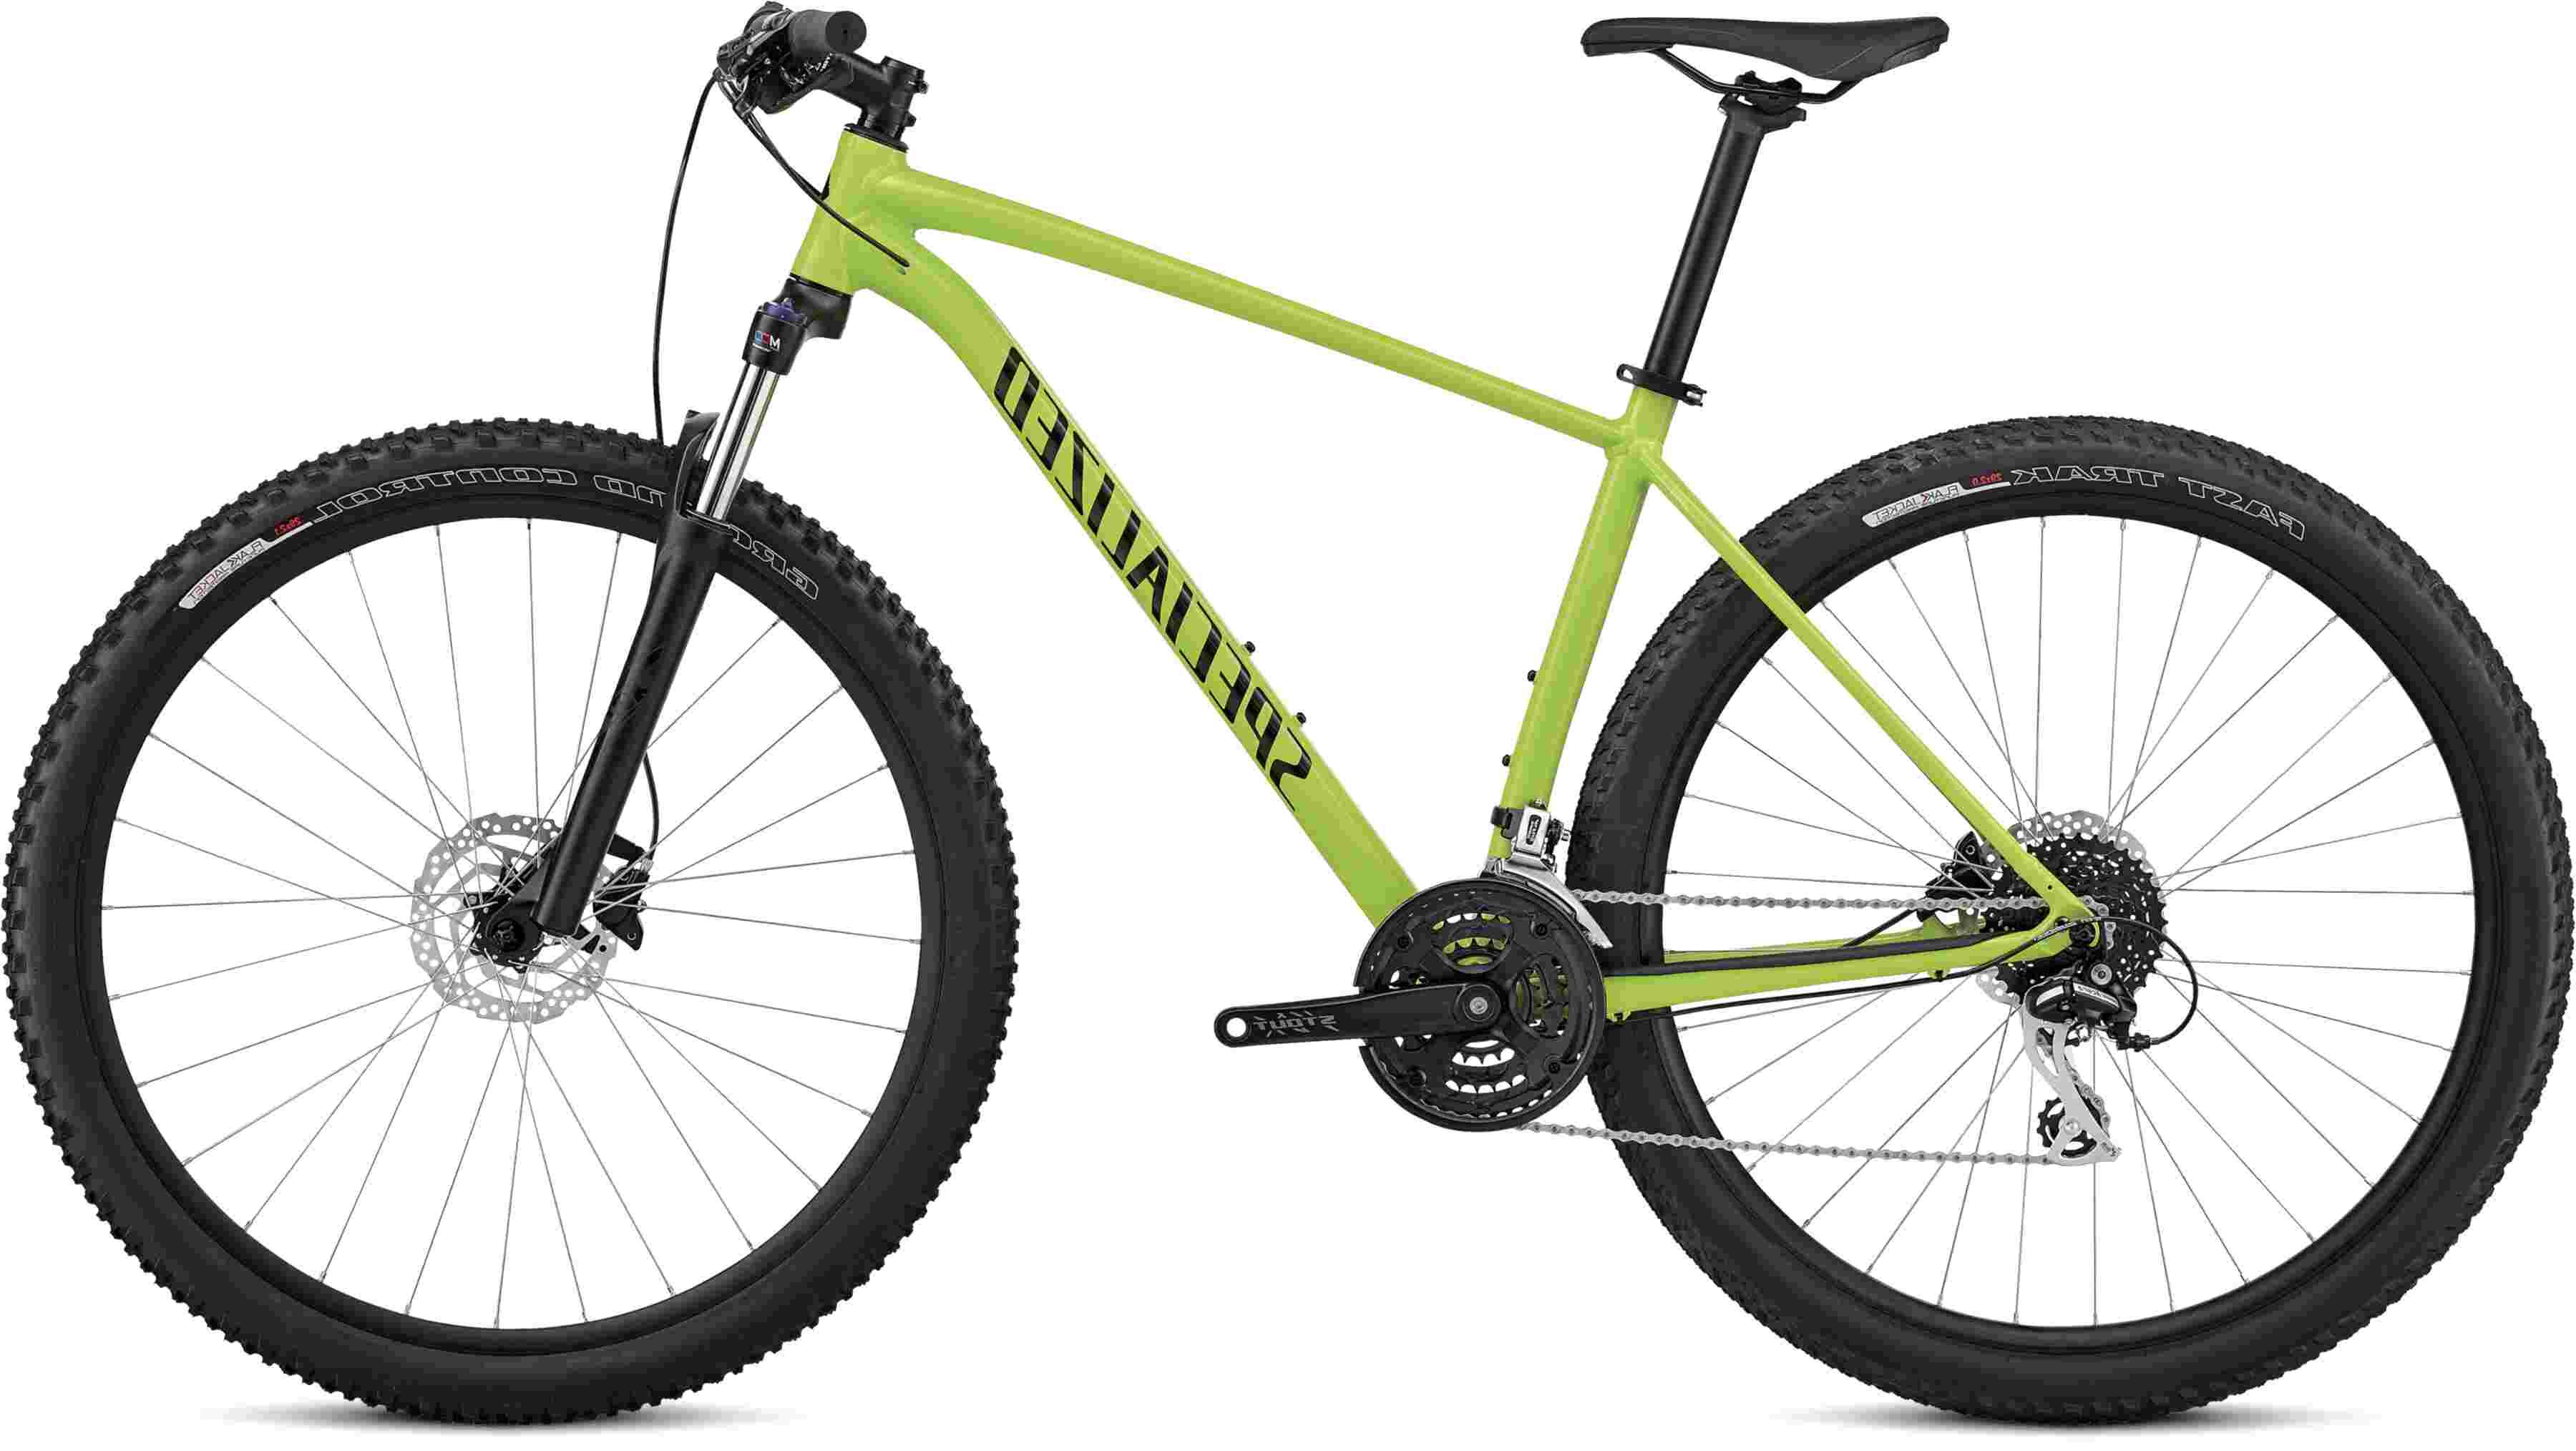 bici specialized de segunda mano